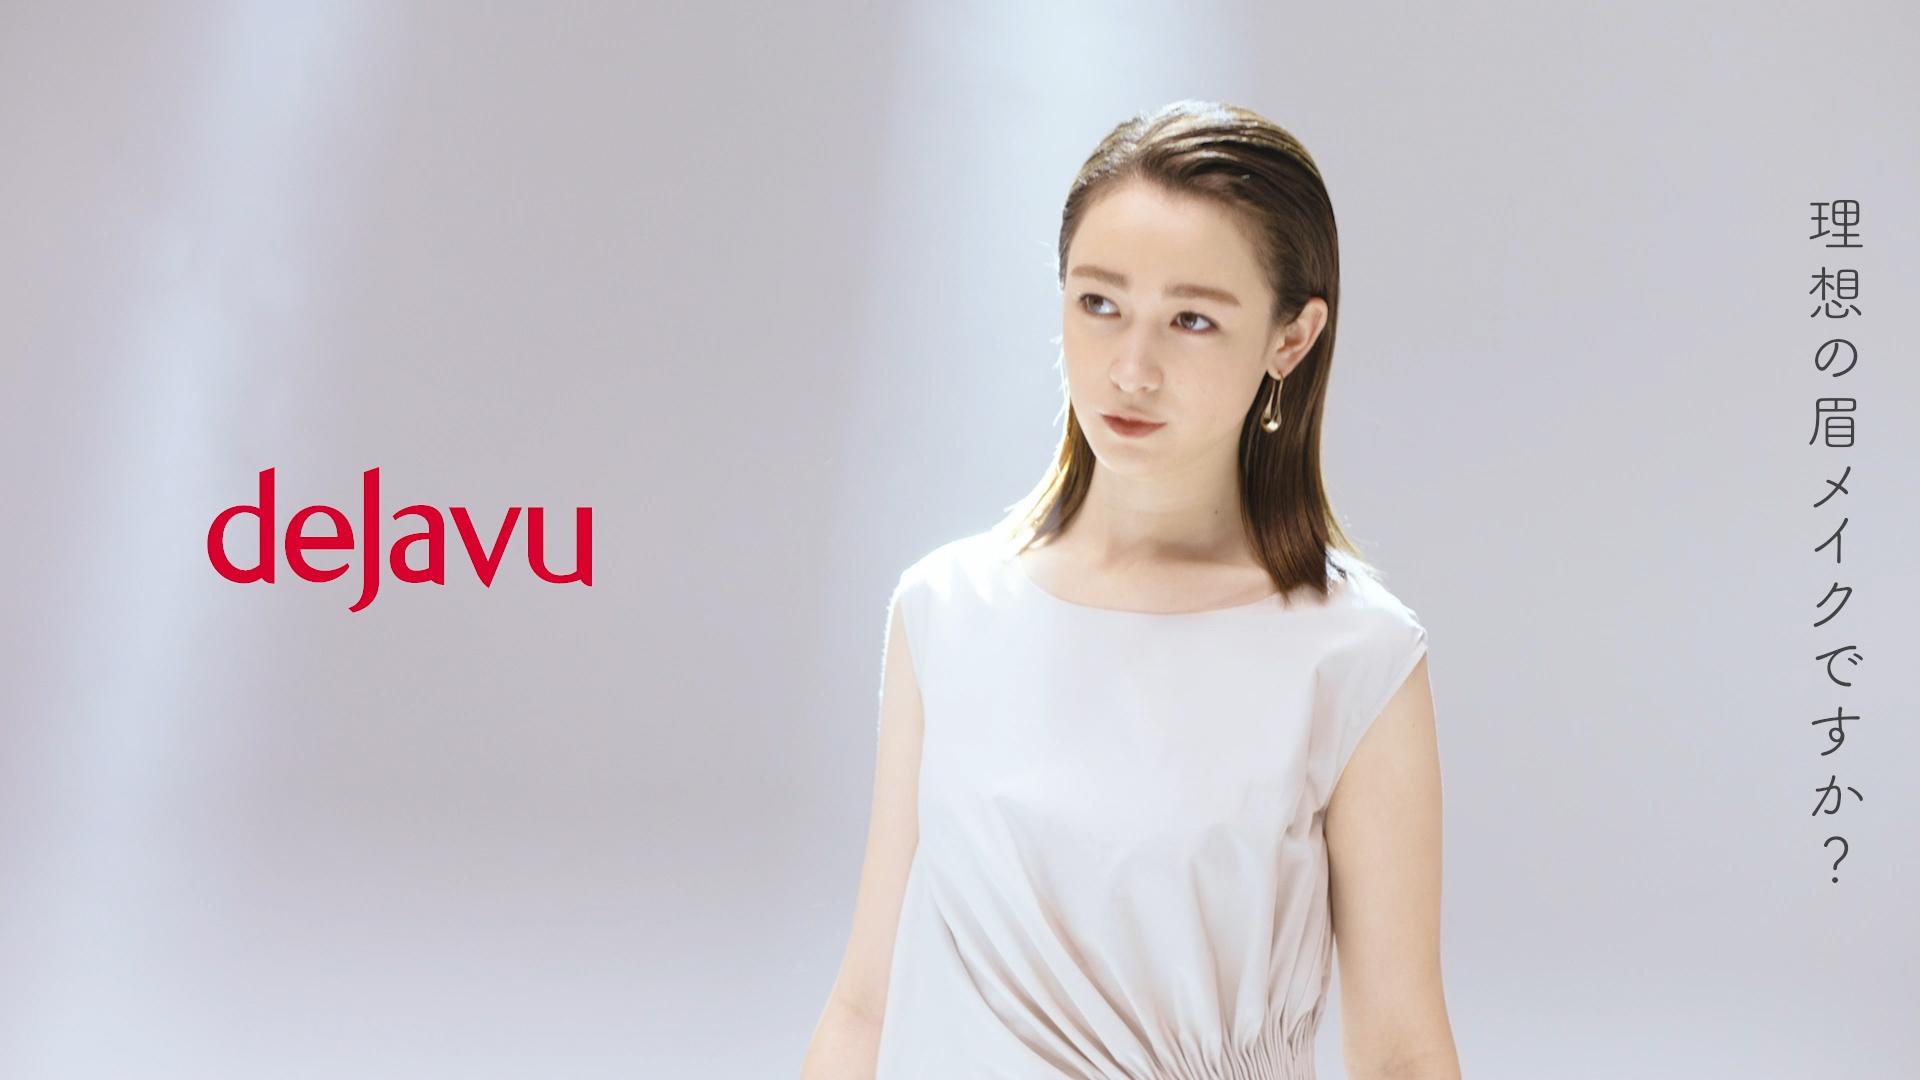 dejavu/フィルム眉カラー WEBCM